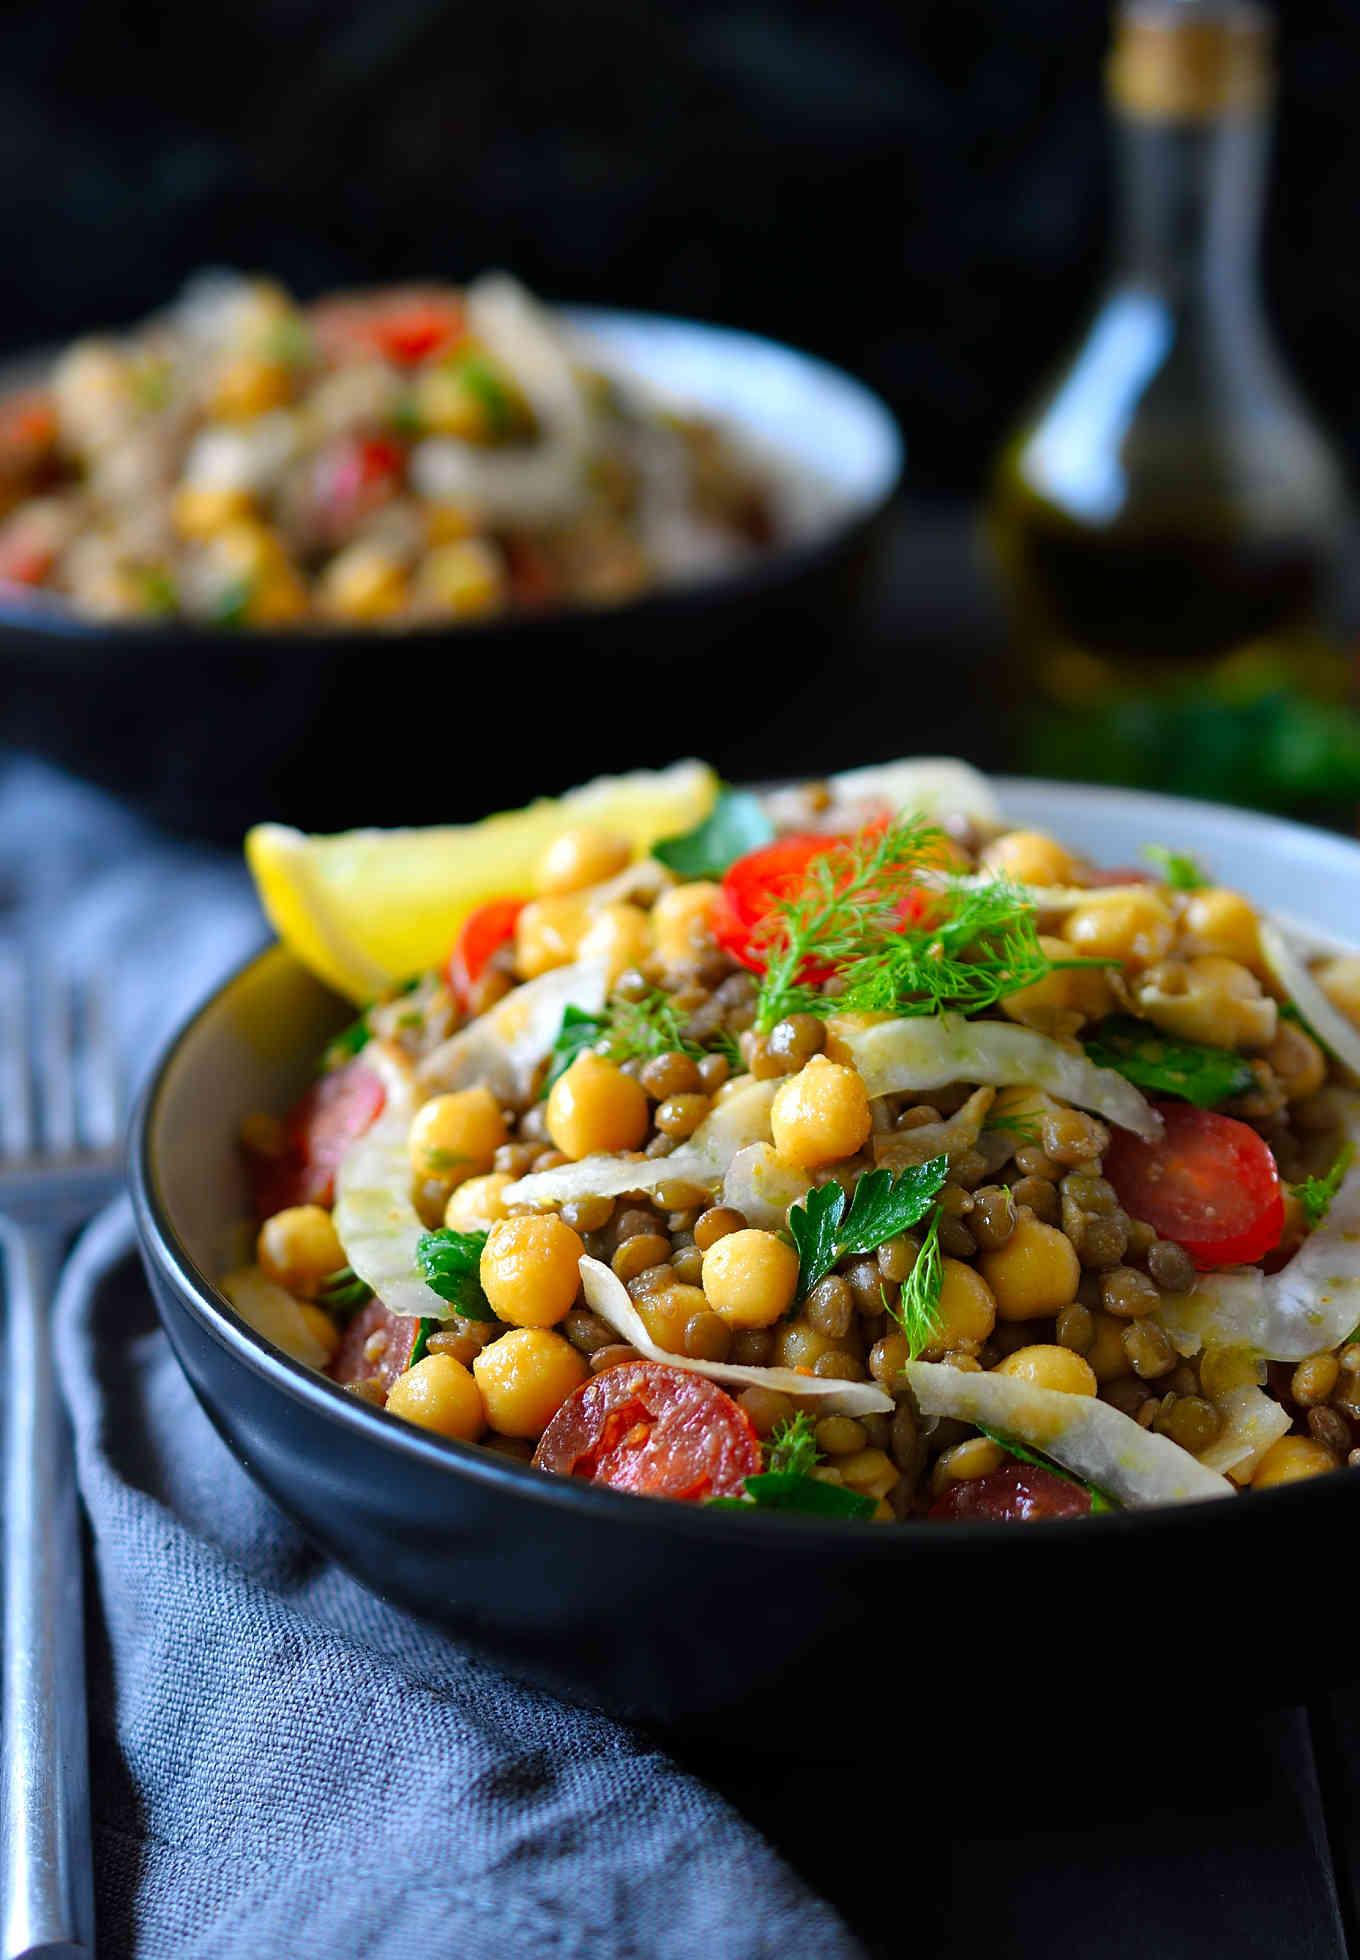 Bean and Lentil Salad